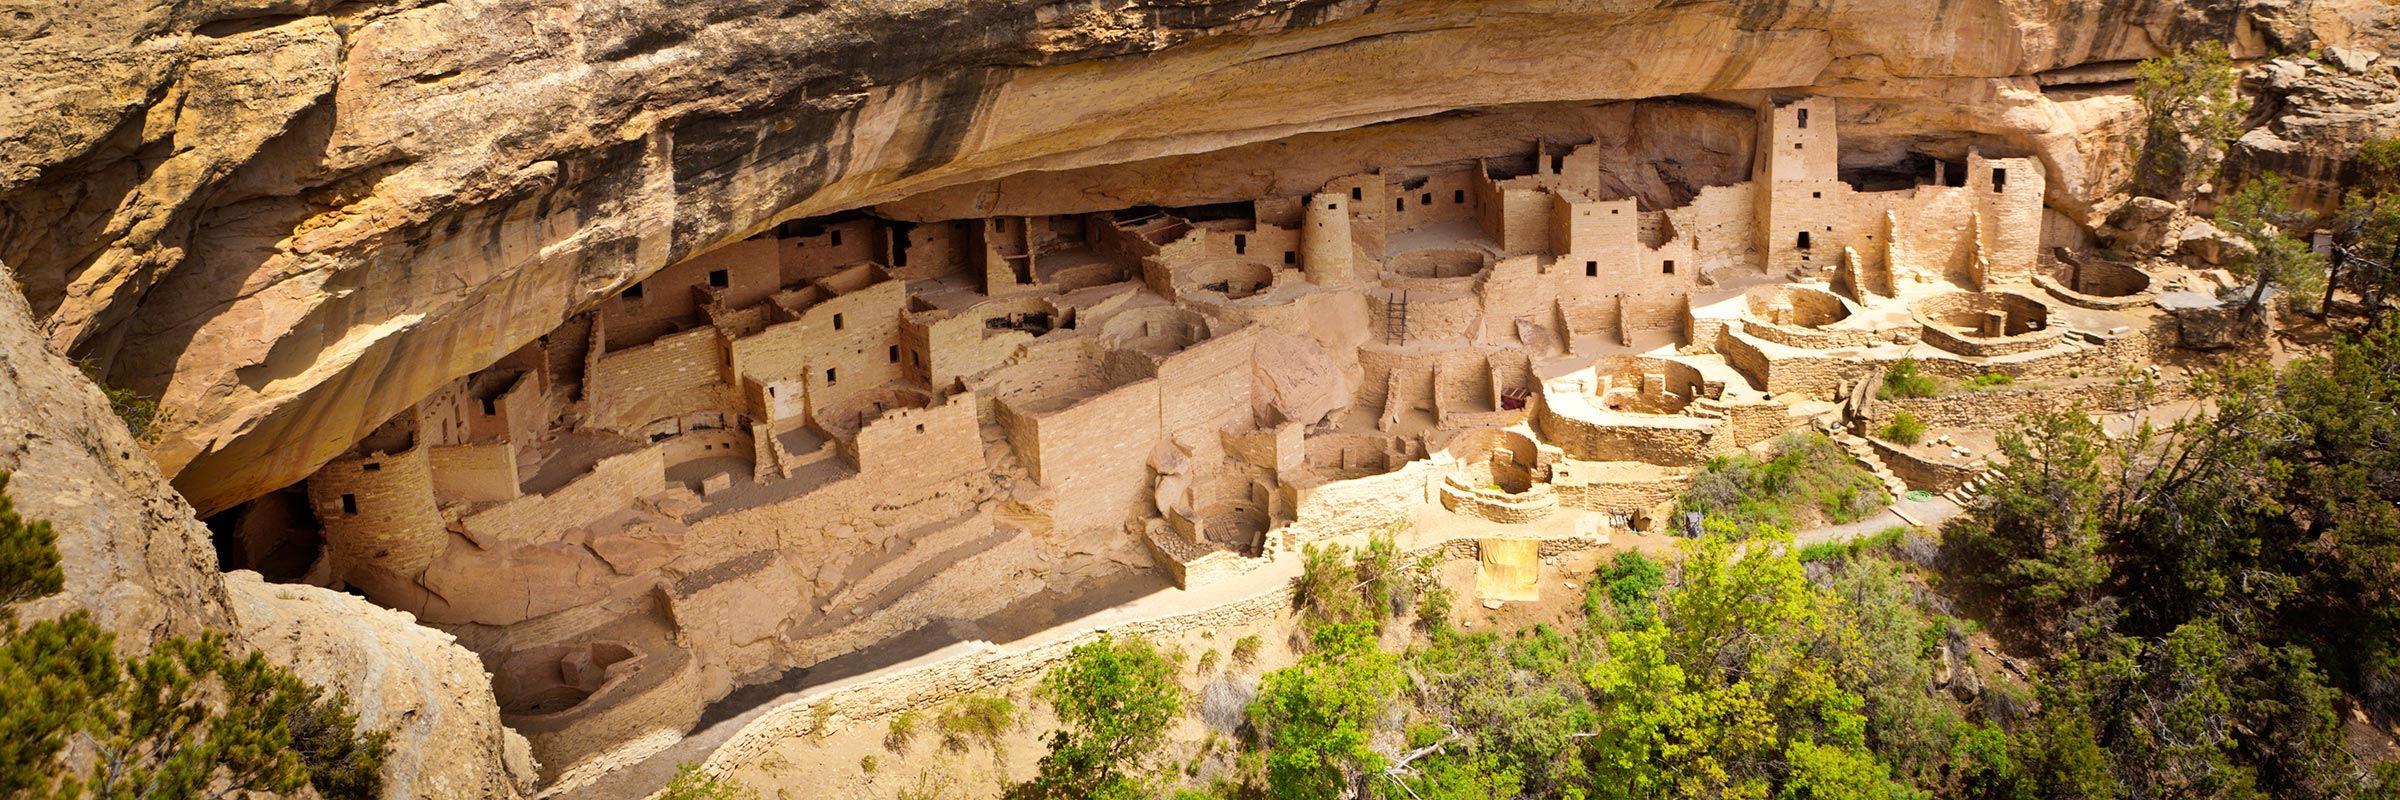 Visit Mesa Verde National Park The USA Audley Travel